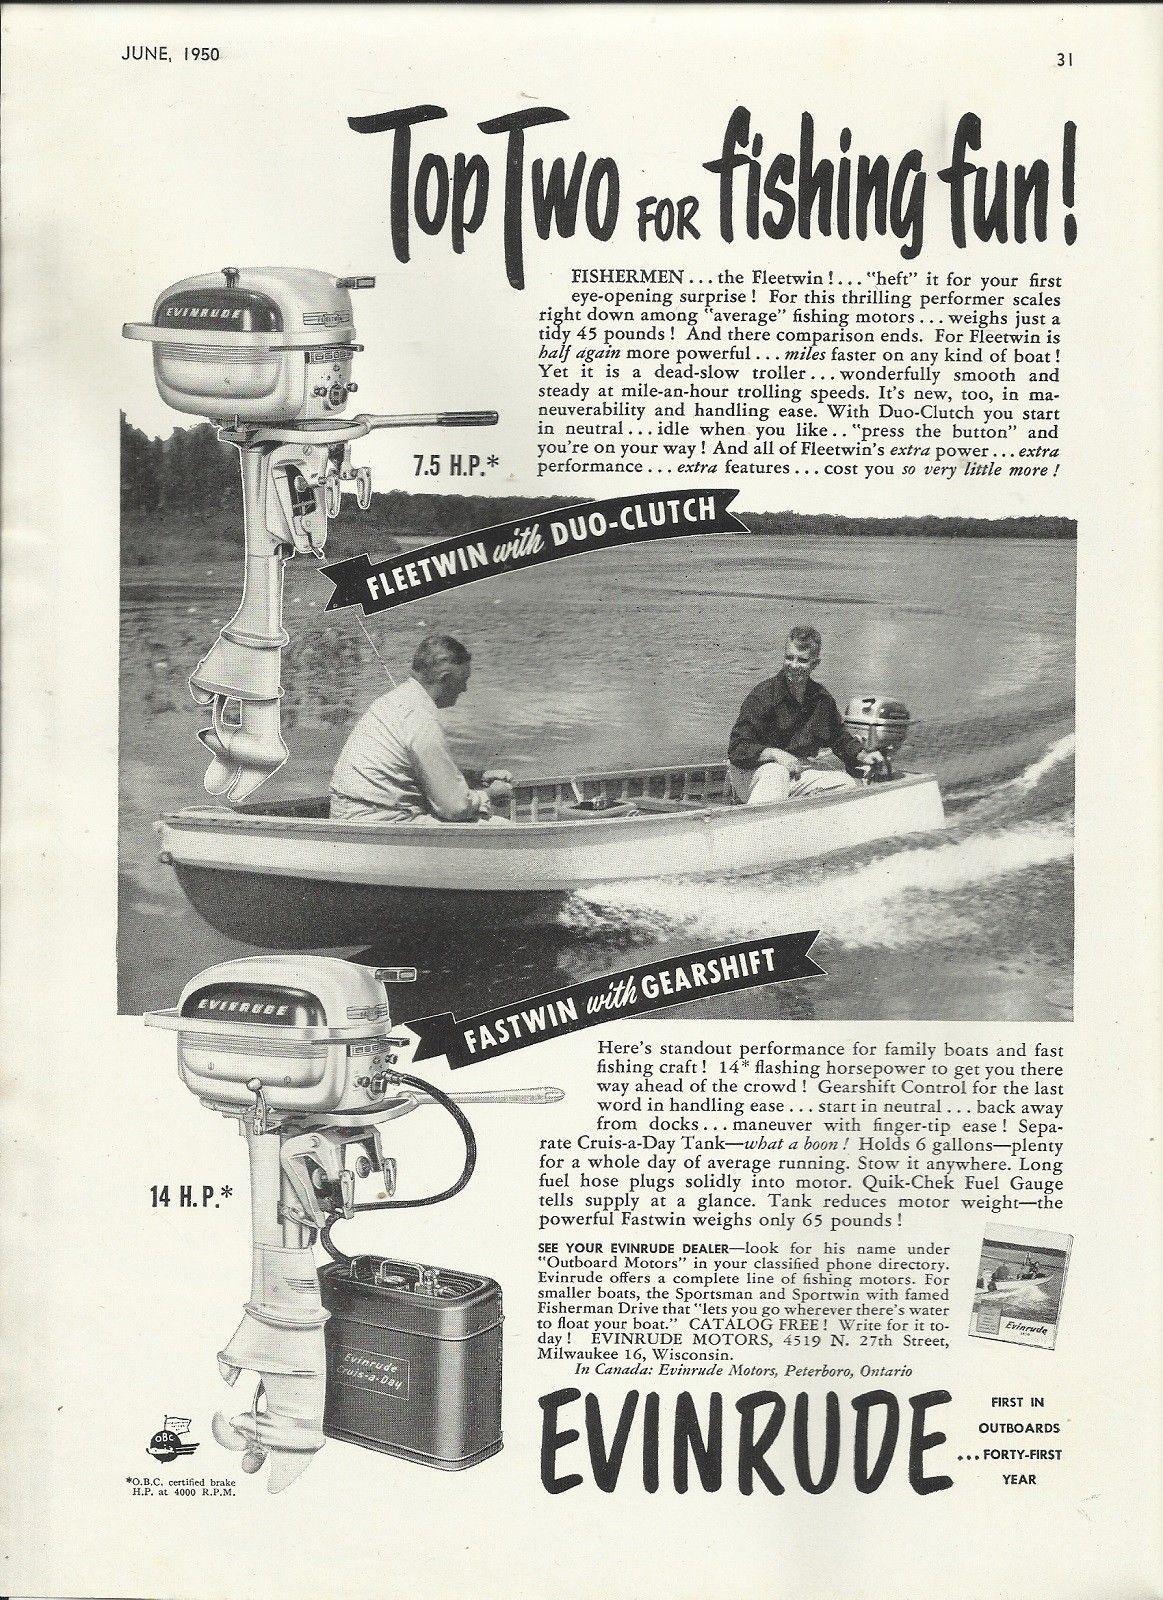 1950 Evinrude Motors Ad- The Fastwin 14 HP  & Fleetwin 7 5 HP